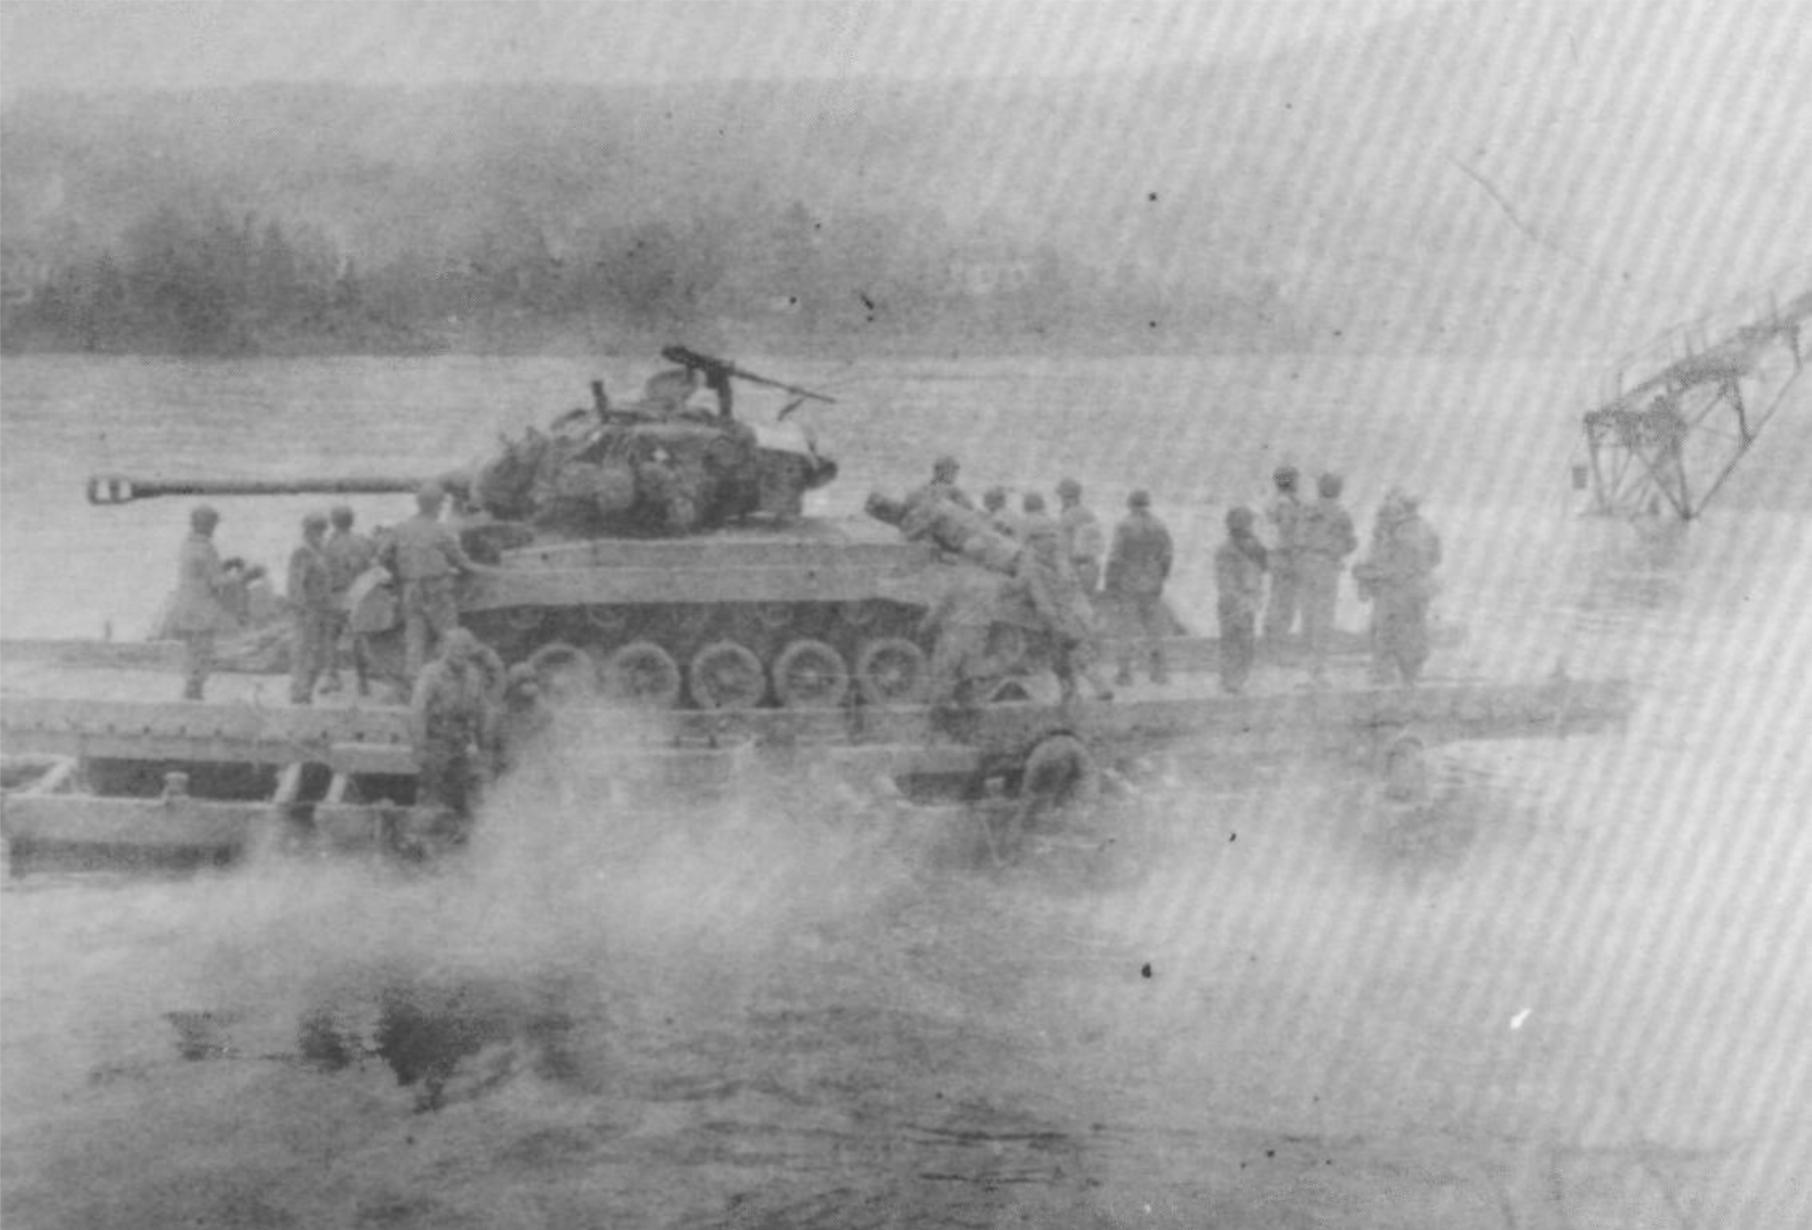 ситуация переход немецких войск через рейн фото уже